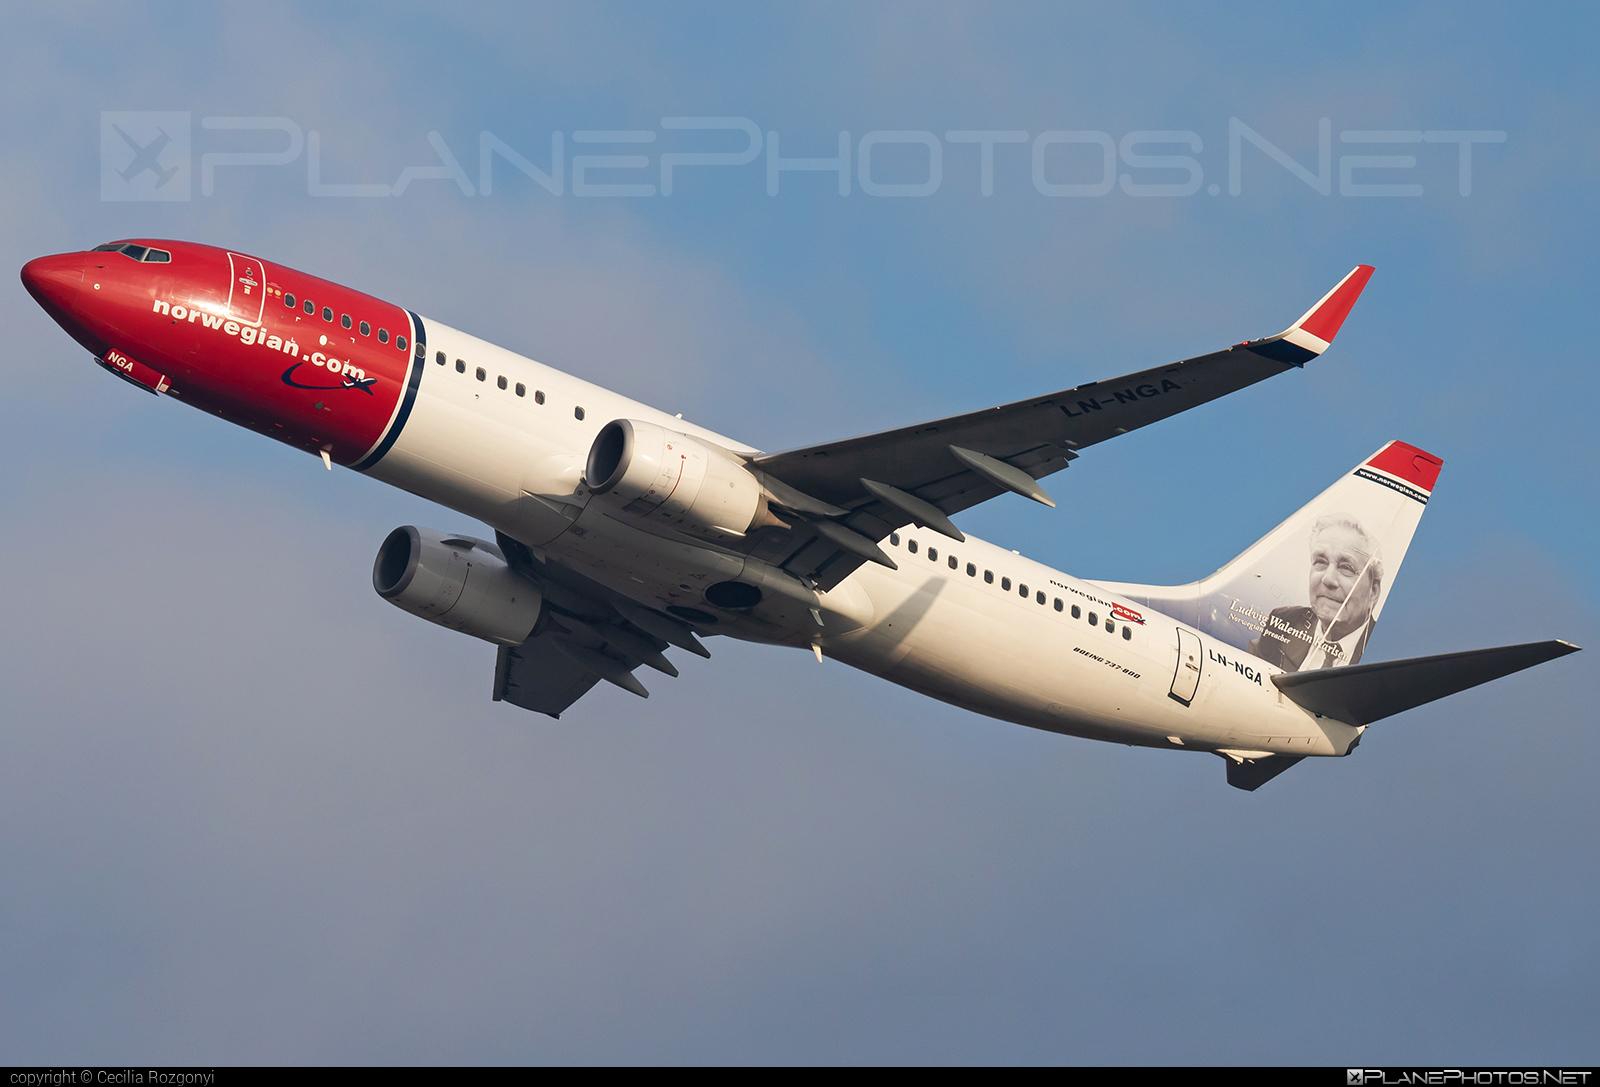 Norwegian Air Shuttle Boeing 737-800 - LN-NGA #b737 #b737nextgen #b737ng #boeing #boeing737 #norwegian #norwegianair #norwegianairshuttle